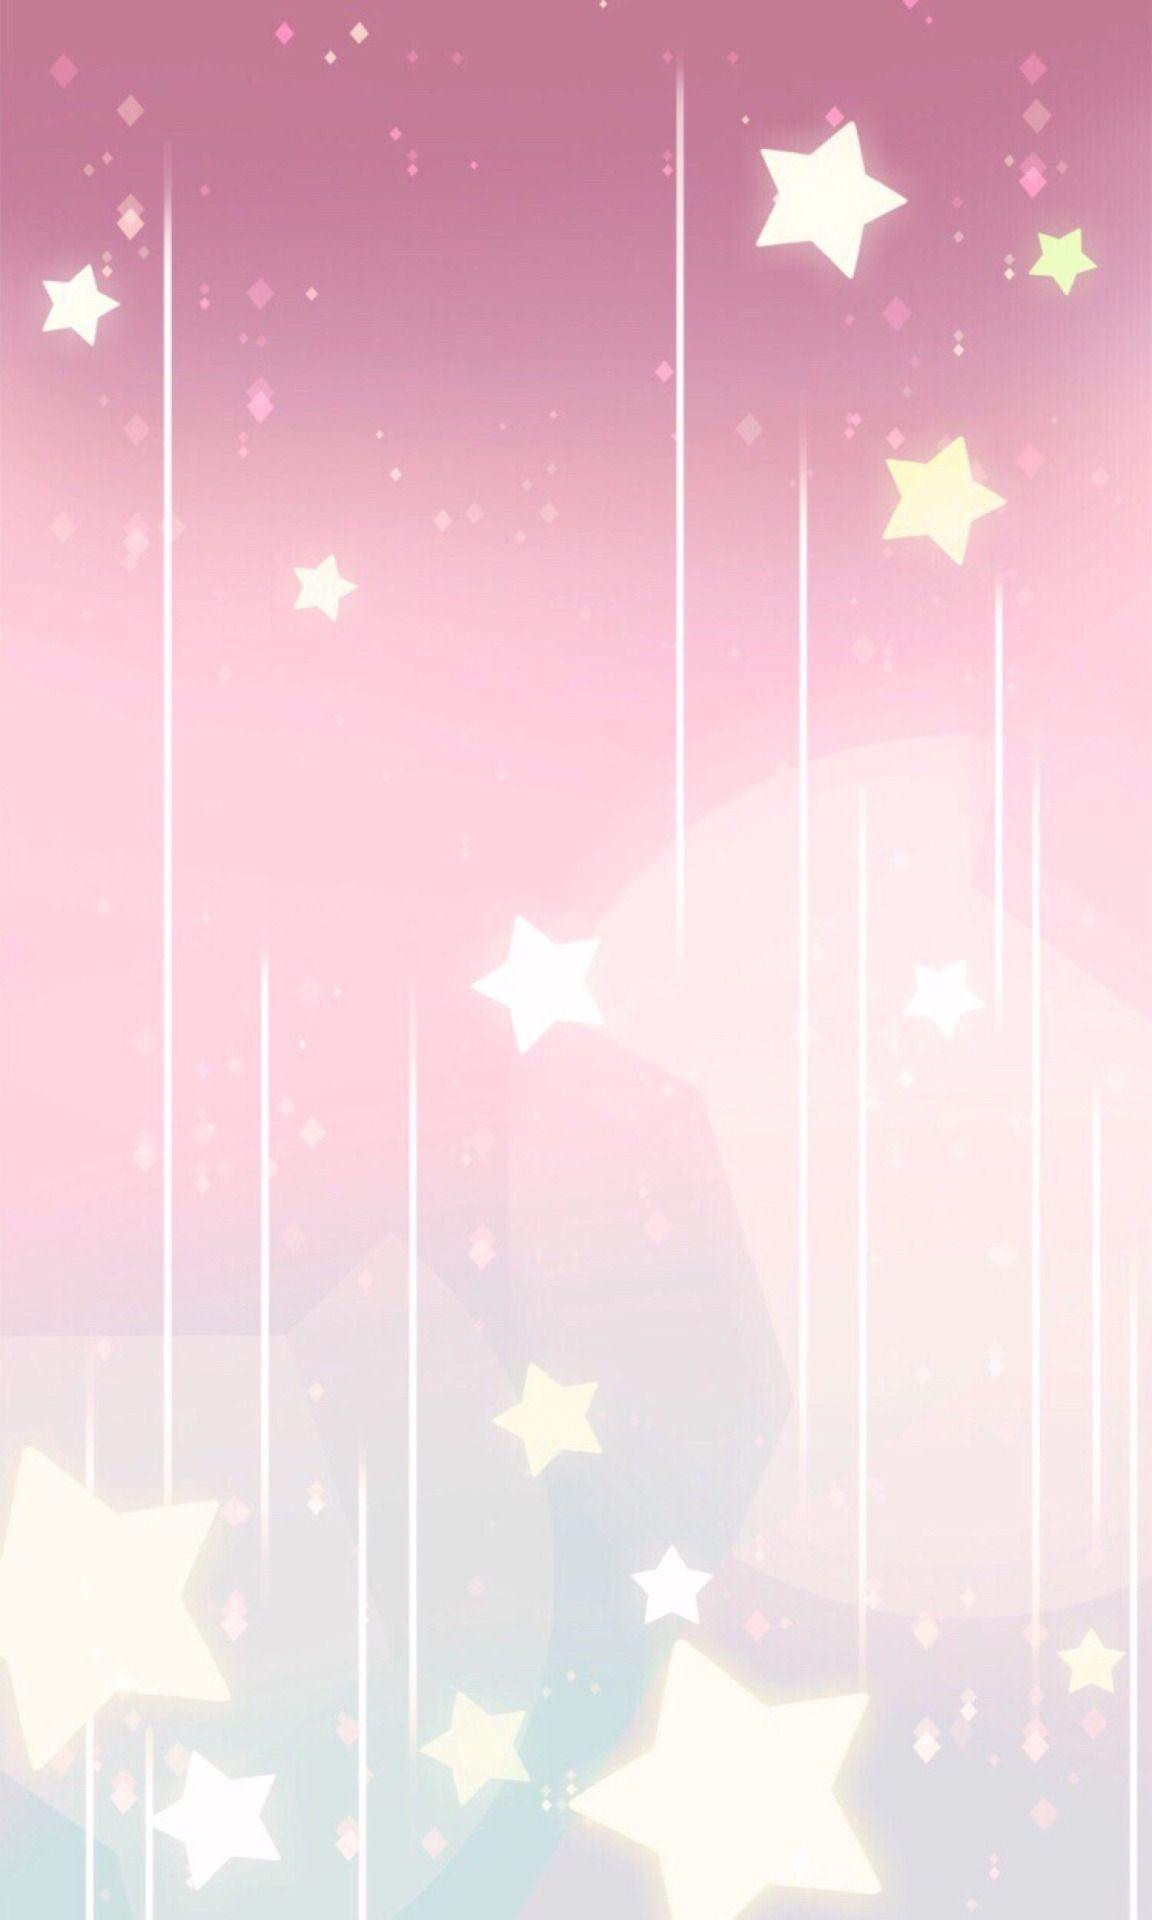 Pink Aesthetic 4k Wallpapers - Wallpaper Cave